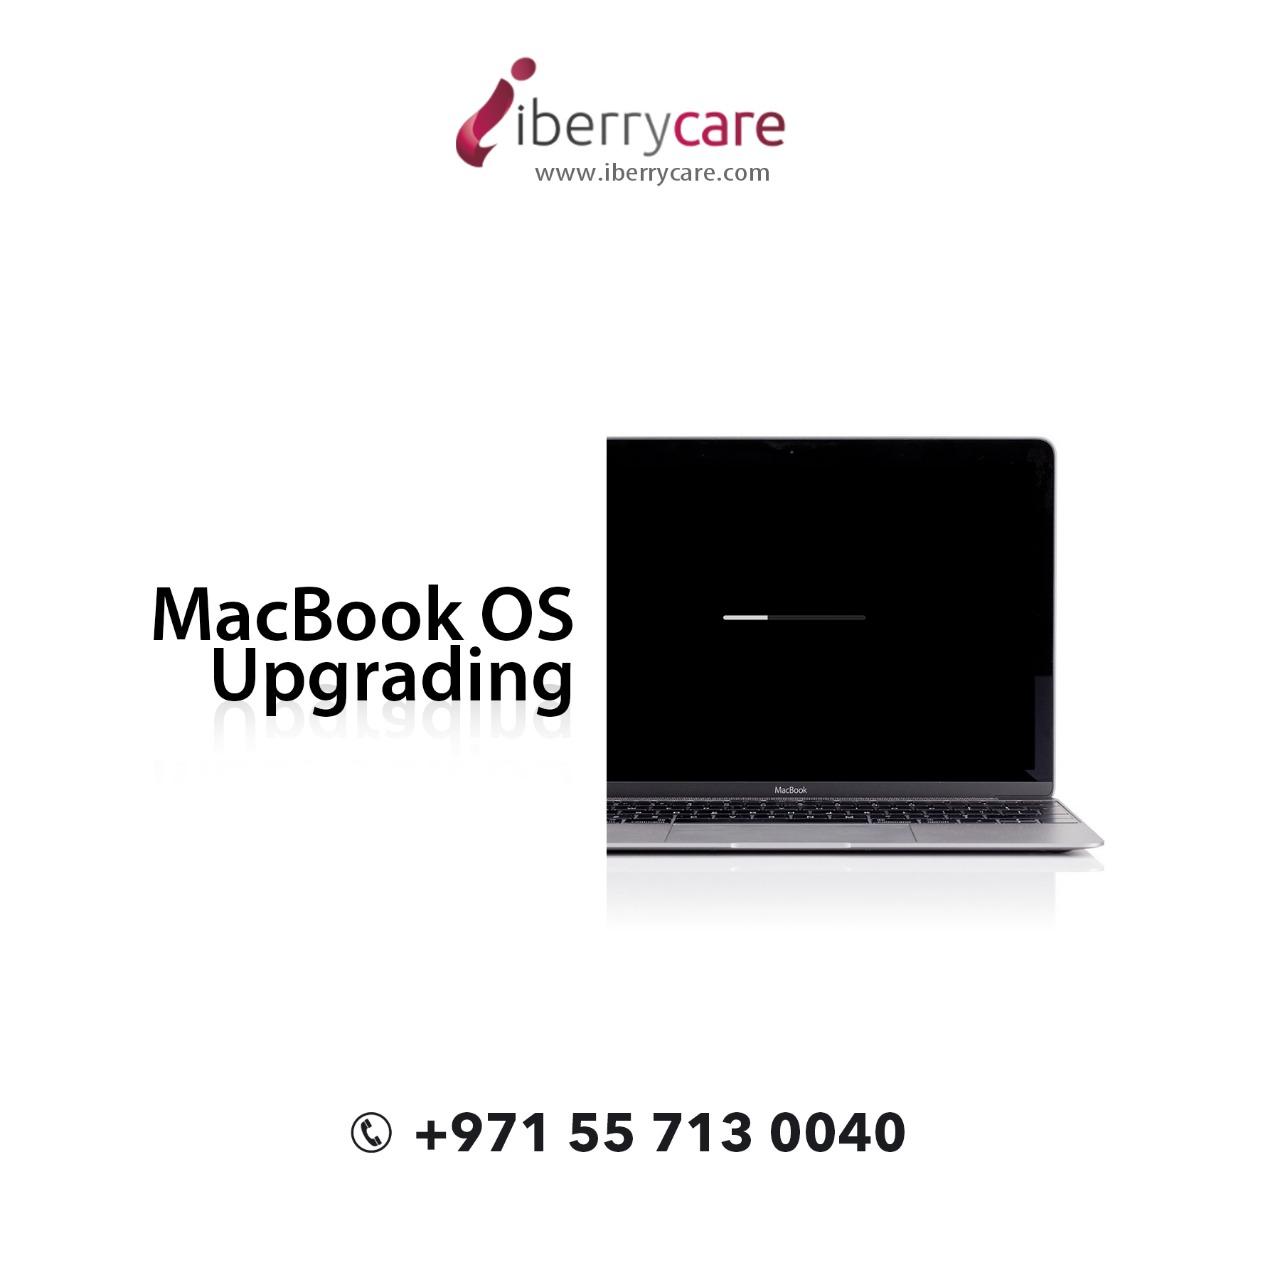 macbook os upgrading.JPG